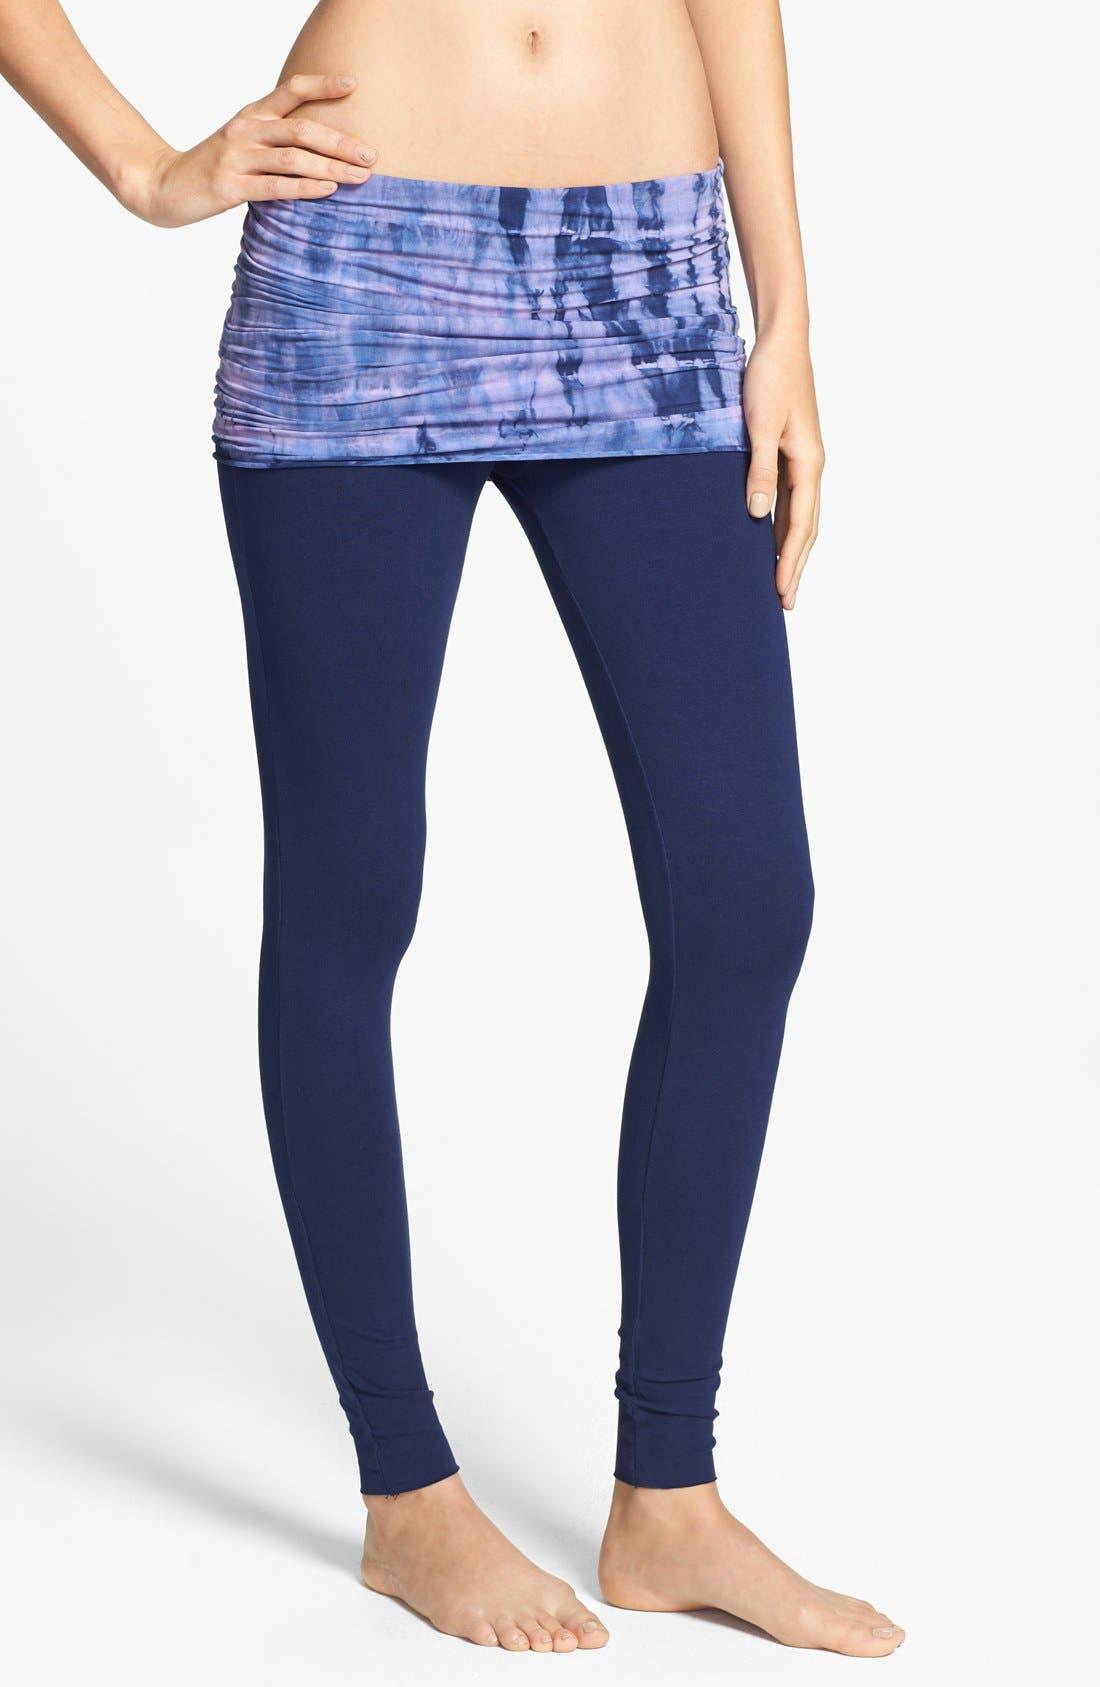 Main Image - Omgirl 'Nomad - Mad Plaid' Organic Cotton Foldover Leggings